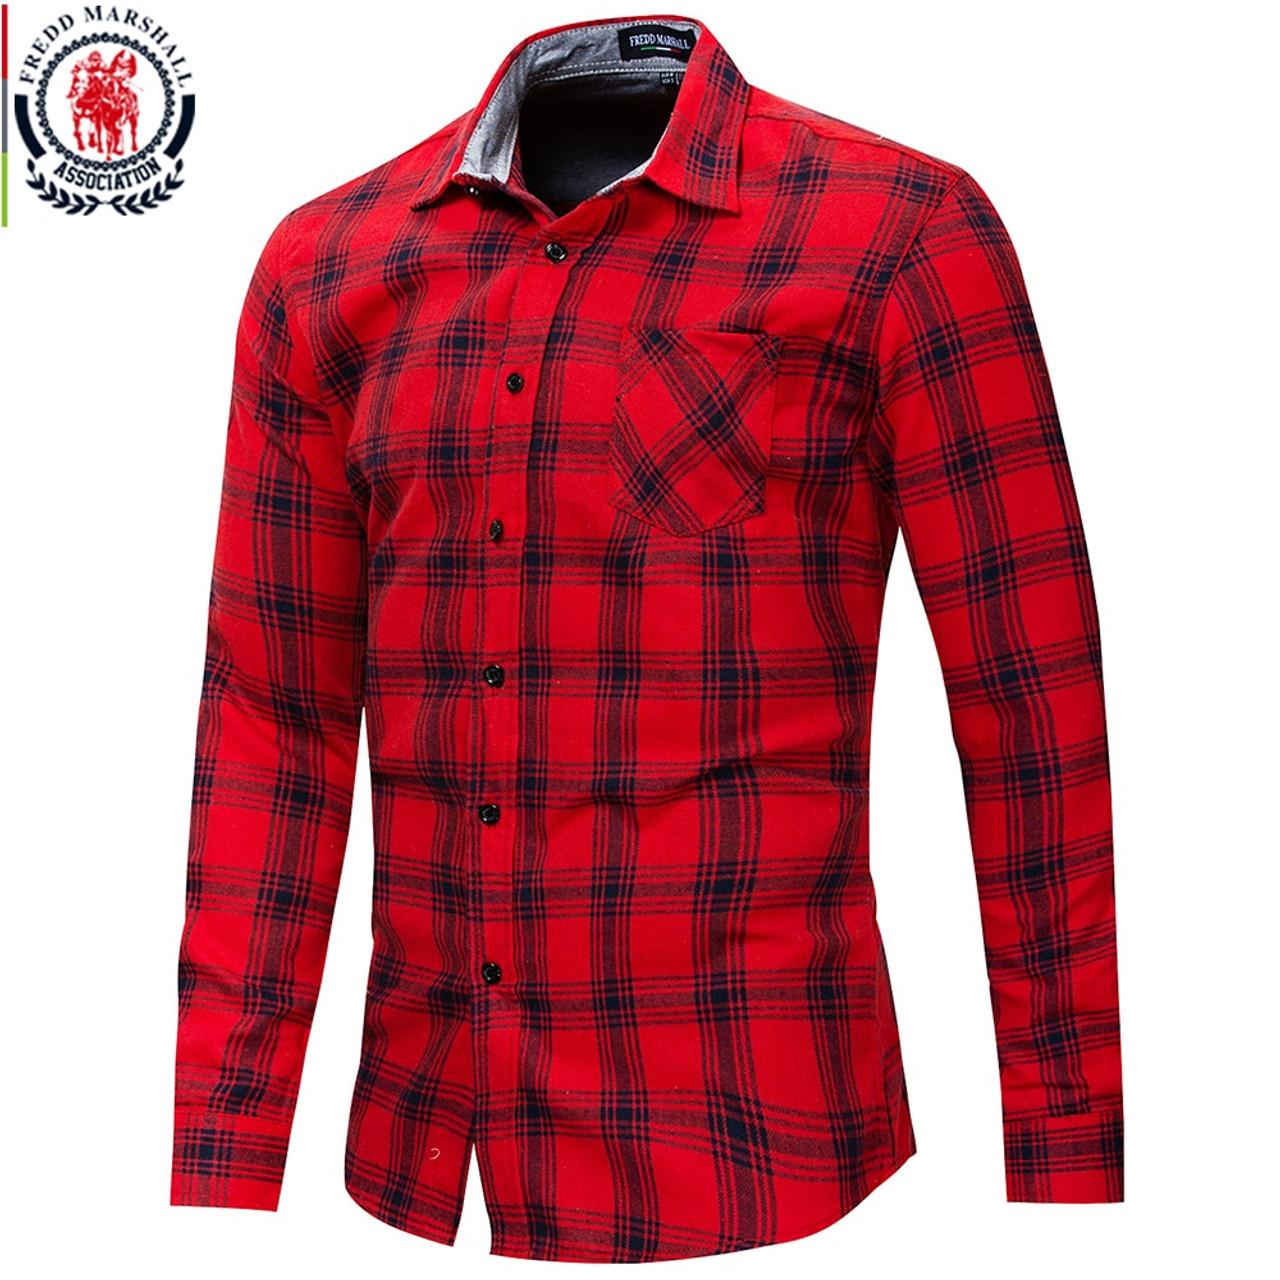 850798b58d ... Fredd Marshall 2018 Autumn New Long Sleeve Slim Fit Plaid Dress Shirt  Men 100% Cotton ...